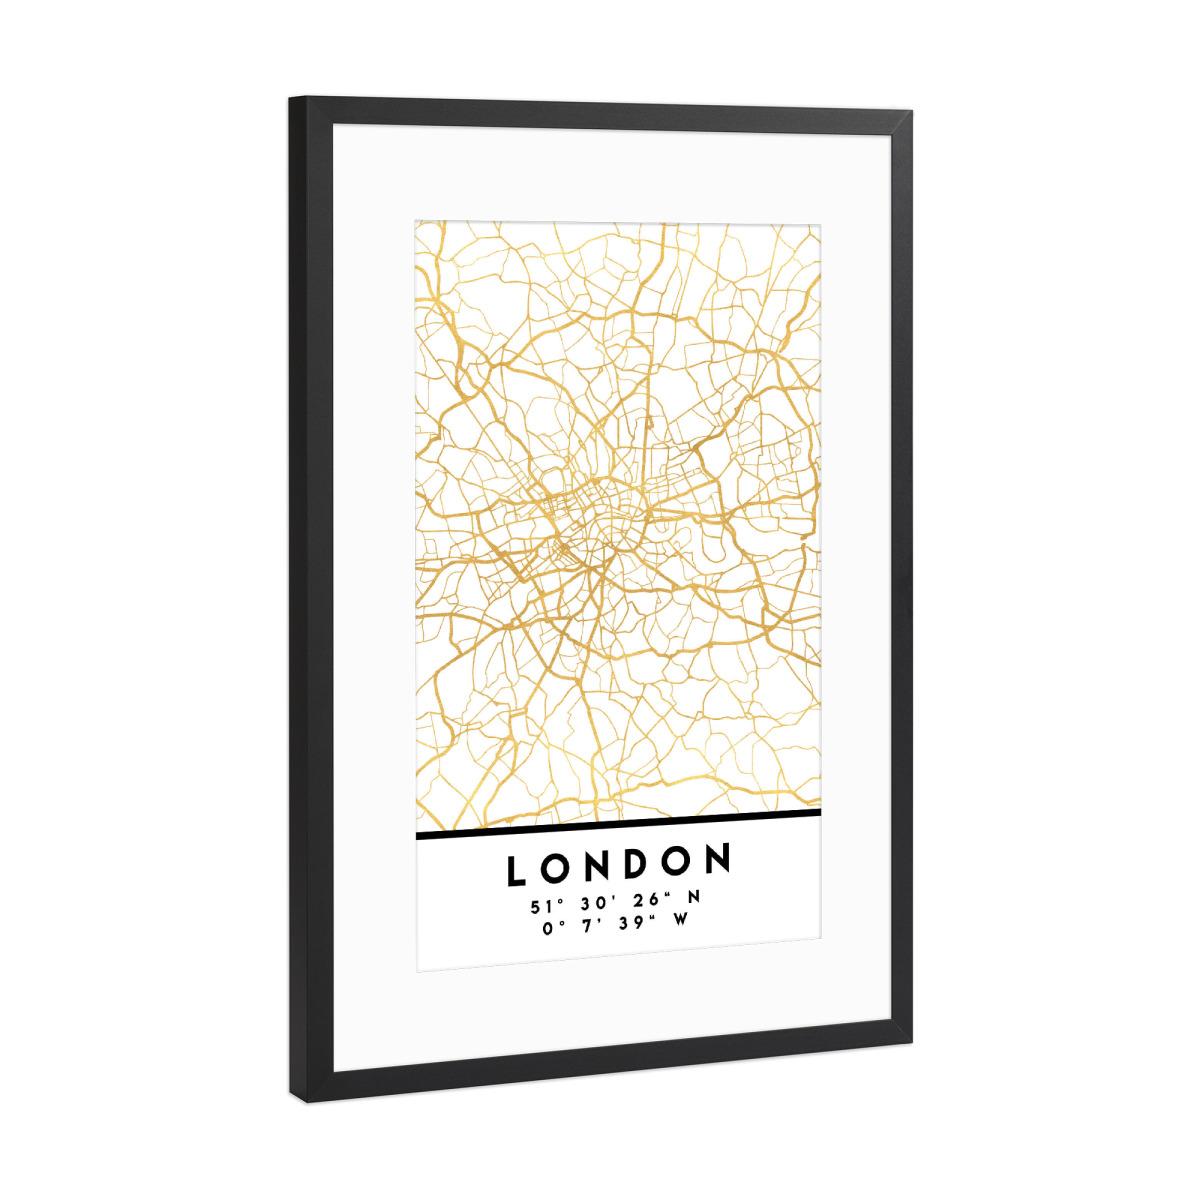 Street Map London Uk.Purchase The London England Street Map Art As A Frame At Artboxone